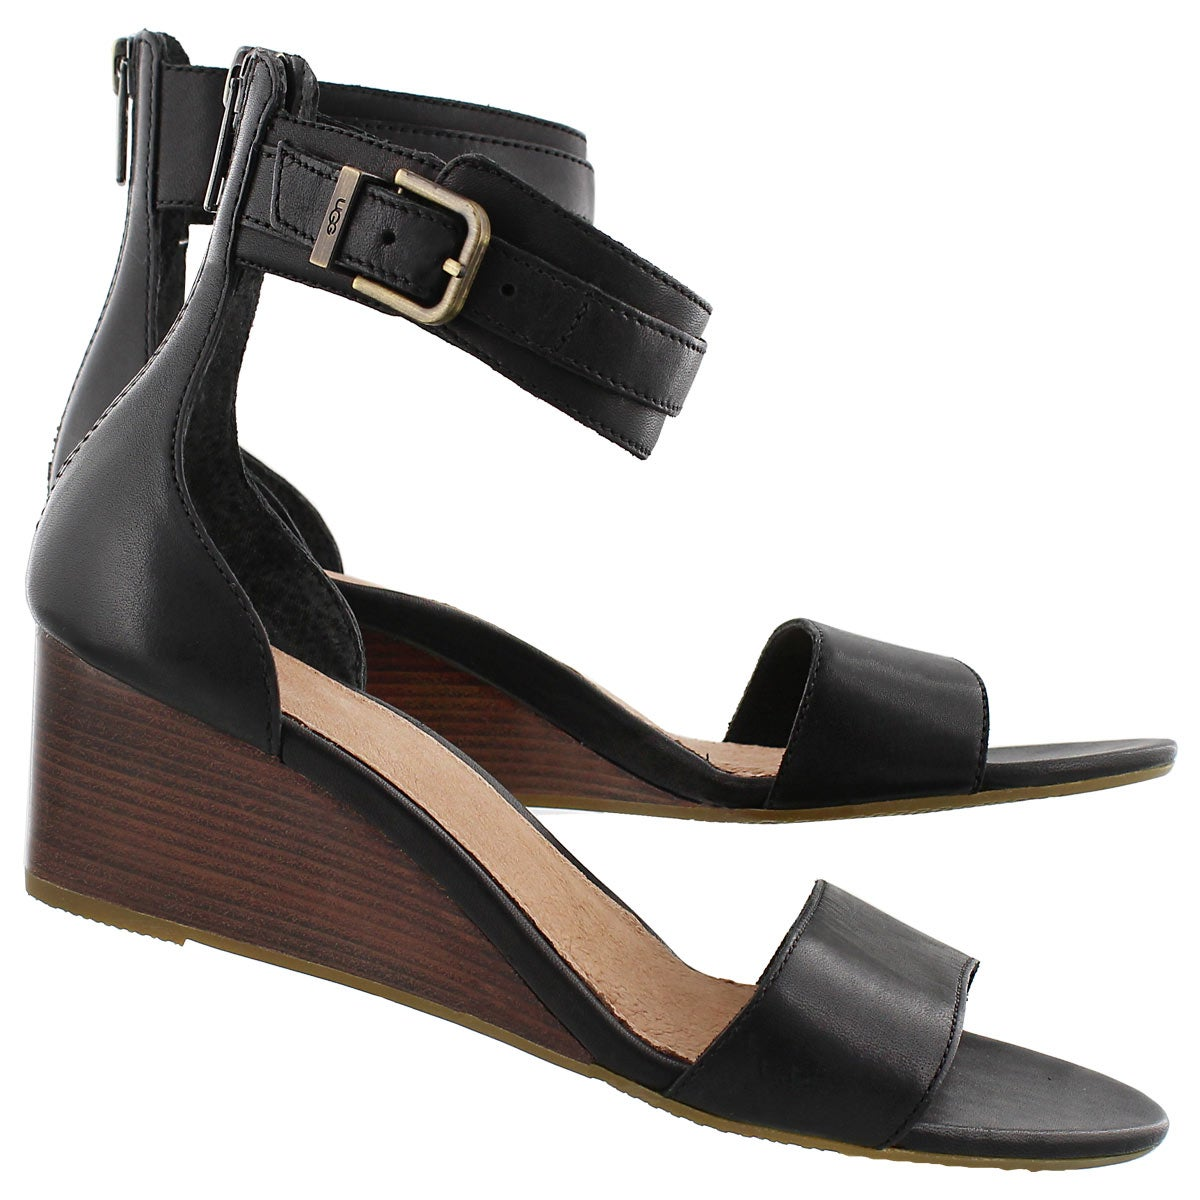 Lds Char black wedge ankle strap sandal